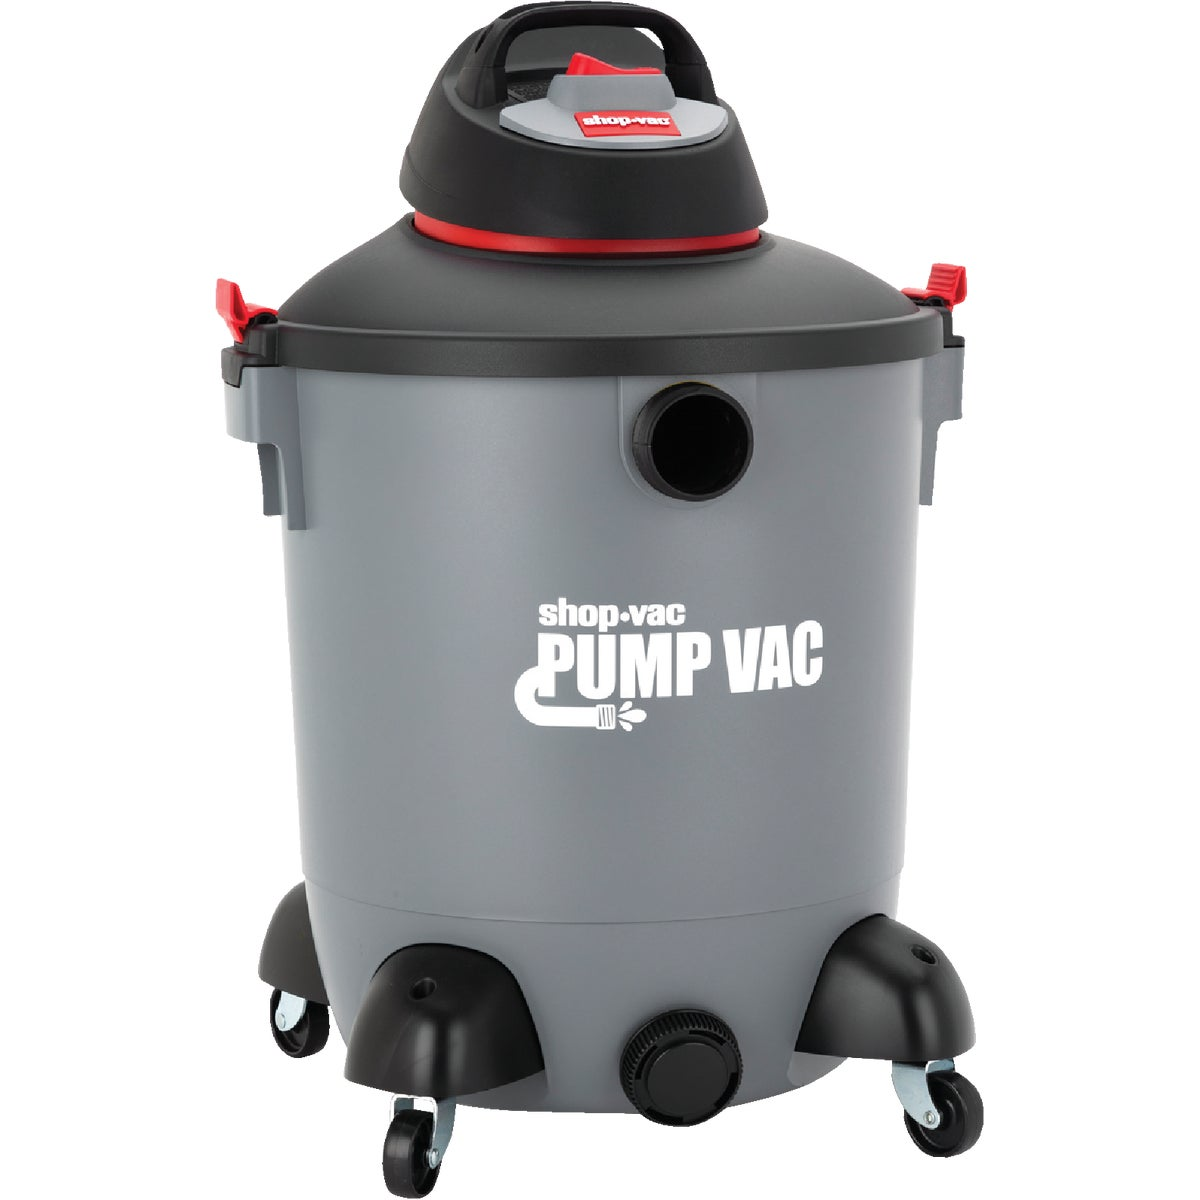 Shop Vac Pump 14 Gal. Wet/Dry Vacuum, 5822400